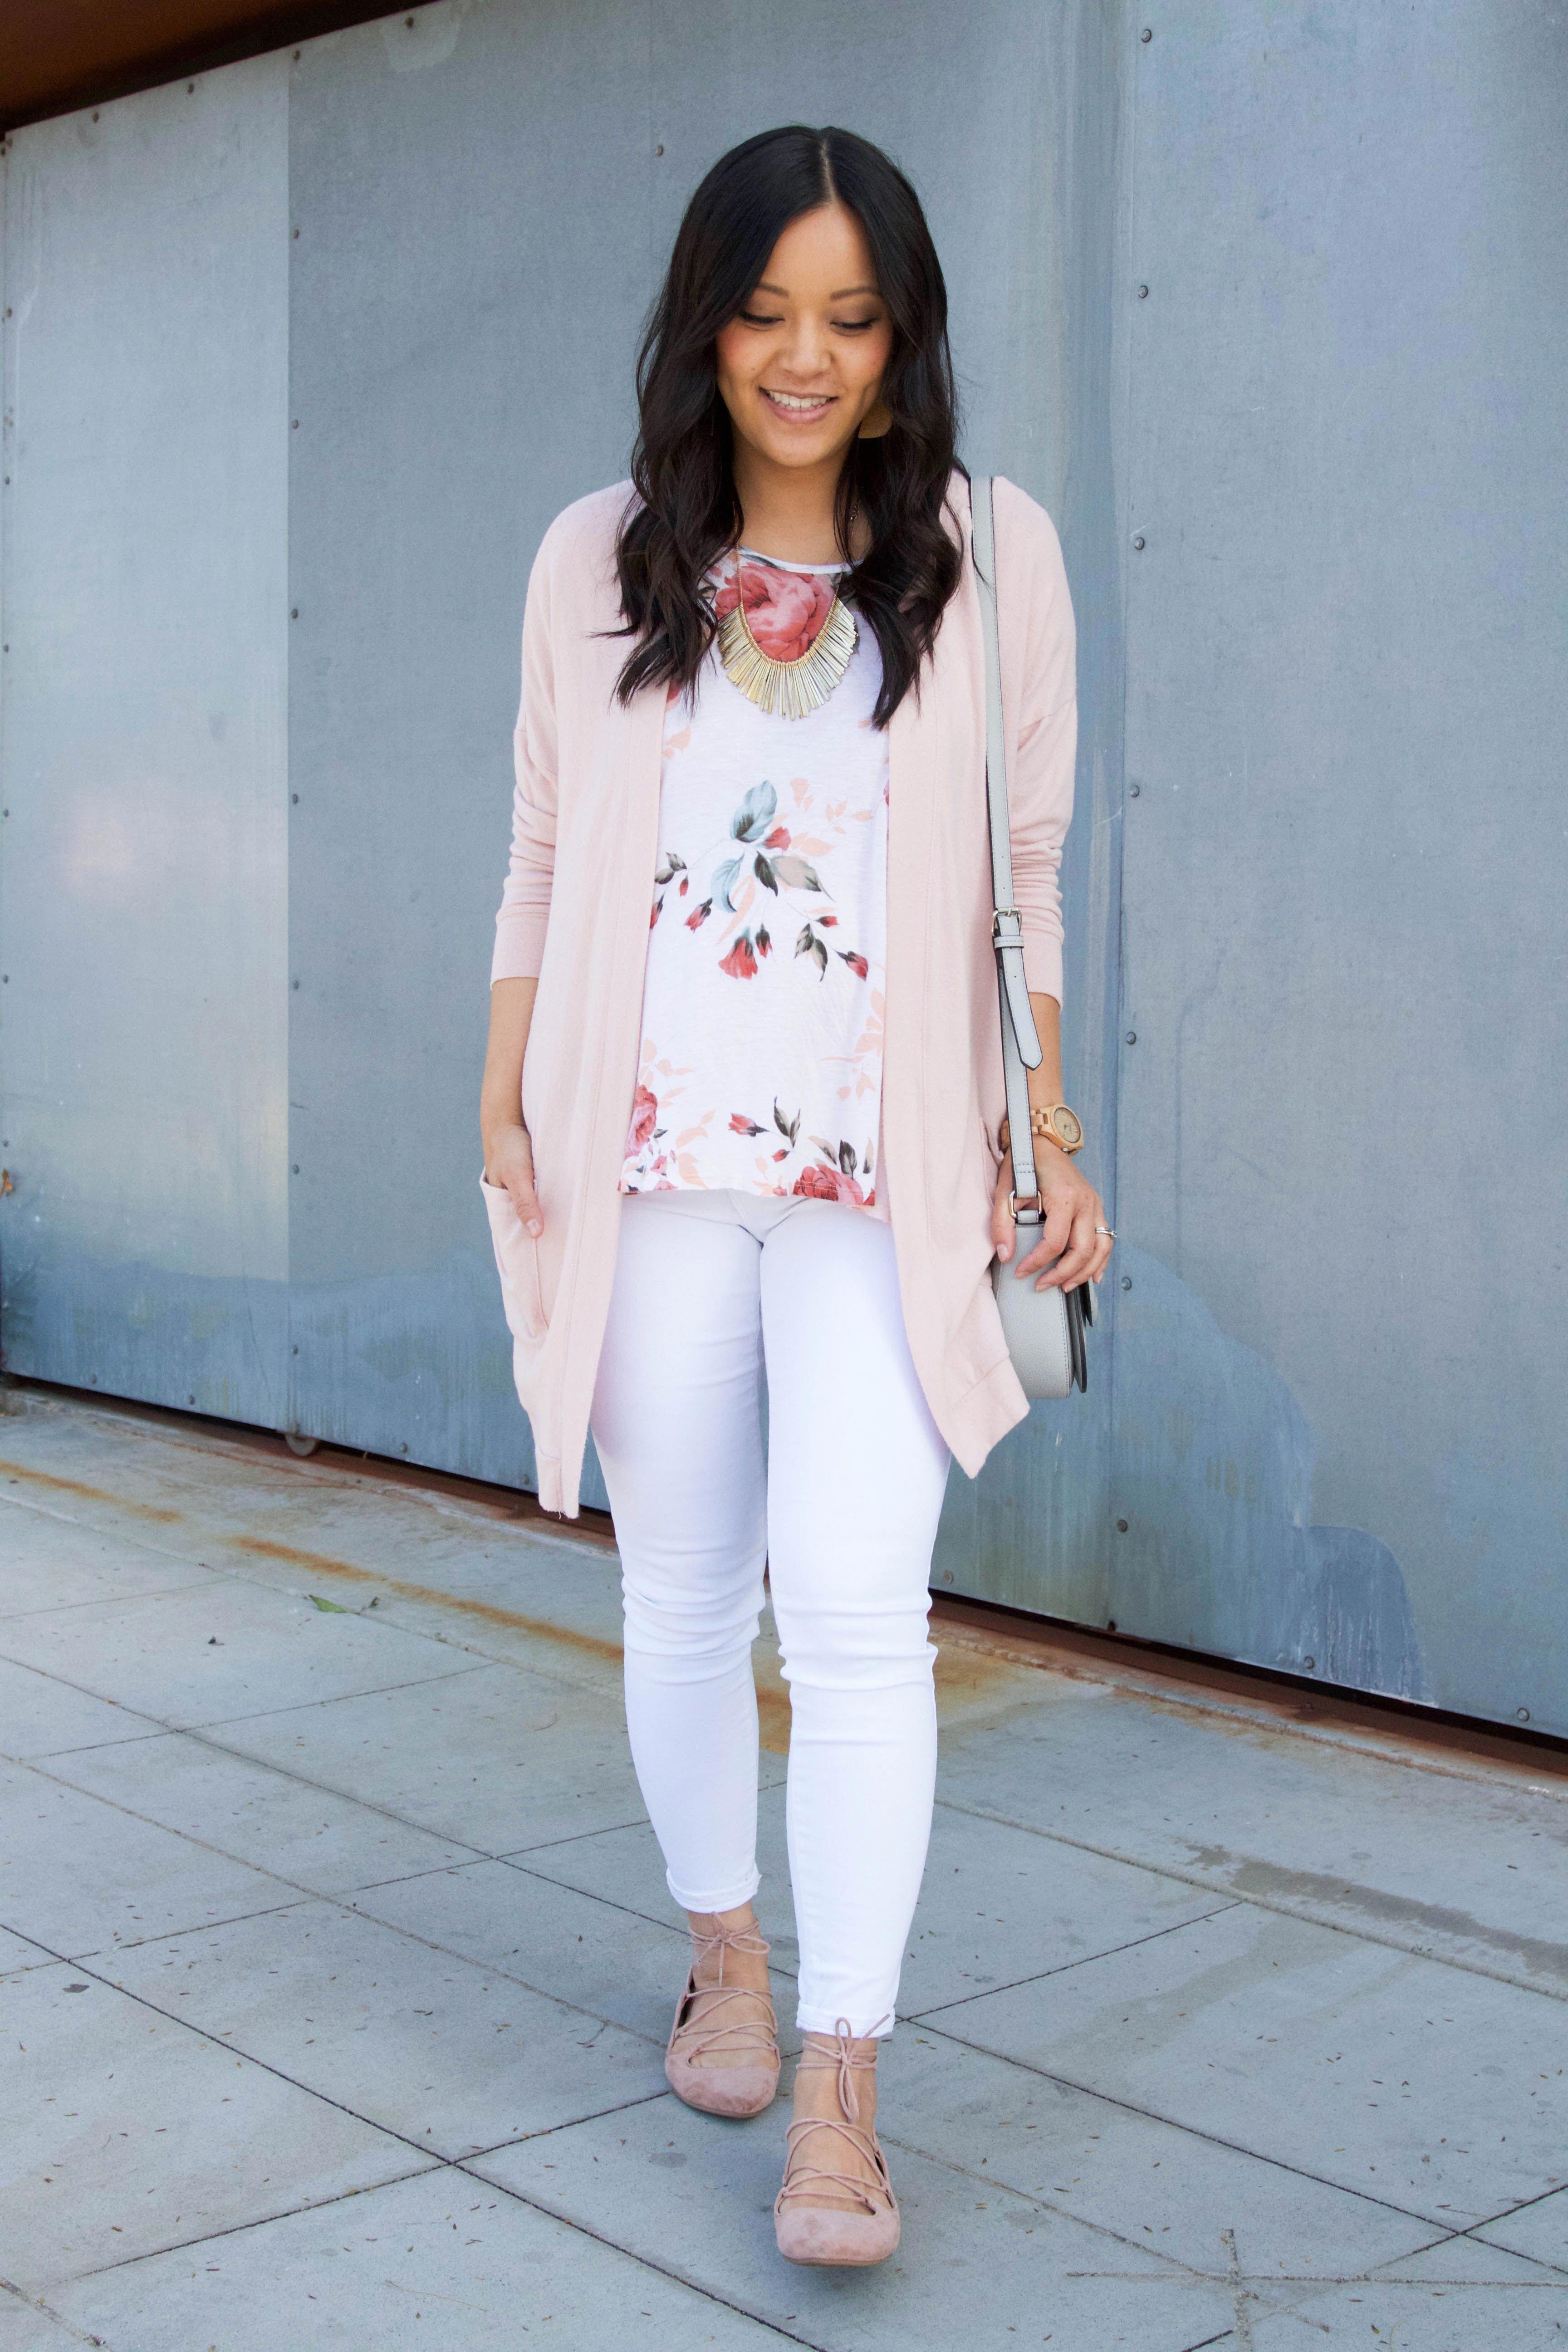 c7a2835a9b8 Blush cardigan + lace up flats + white jeans + floral top + statement  necklace  PlusSizejeansoutfit